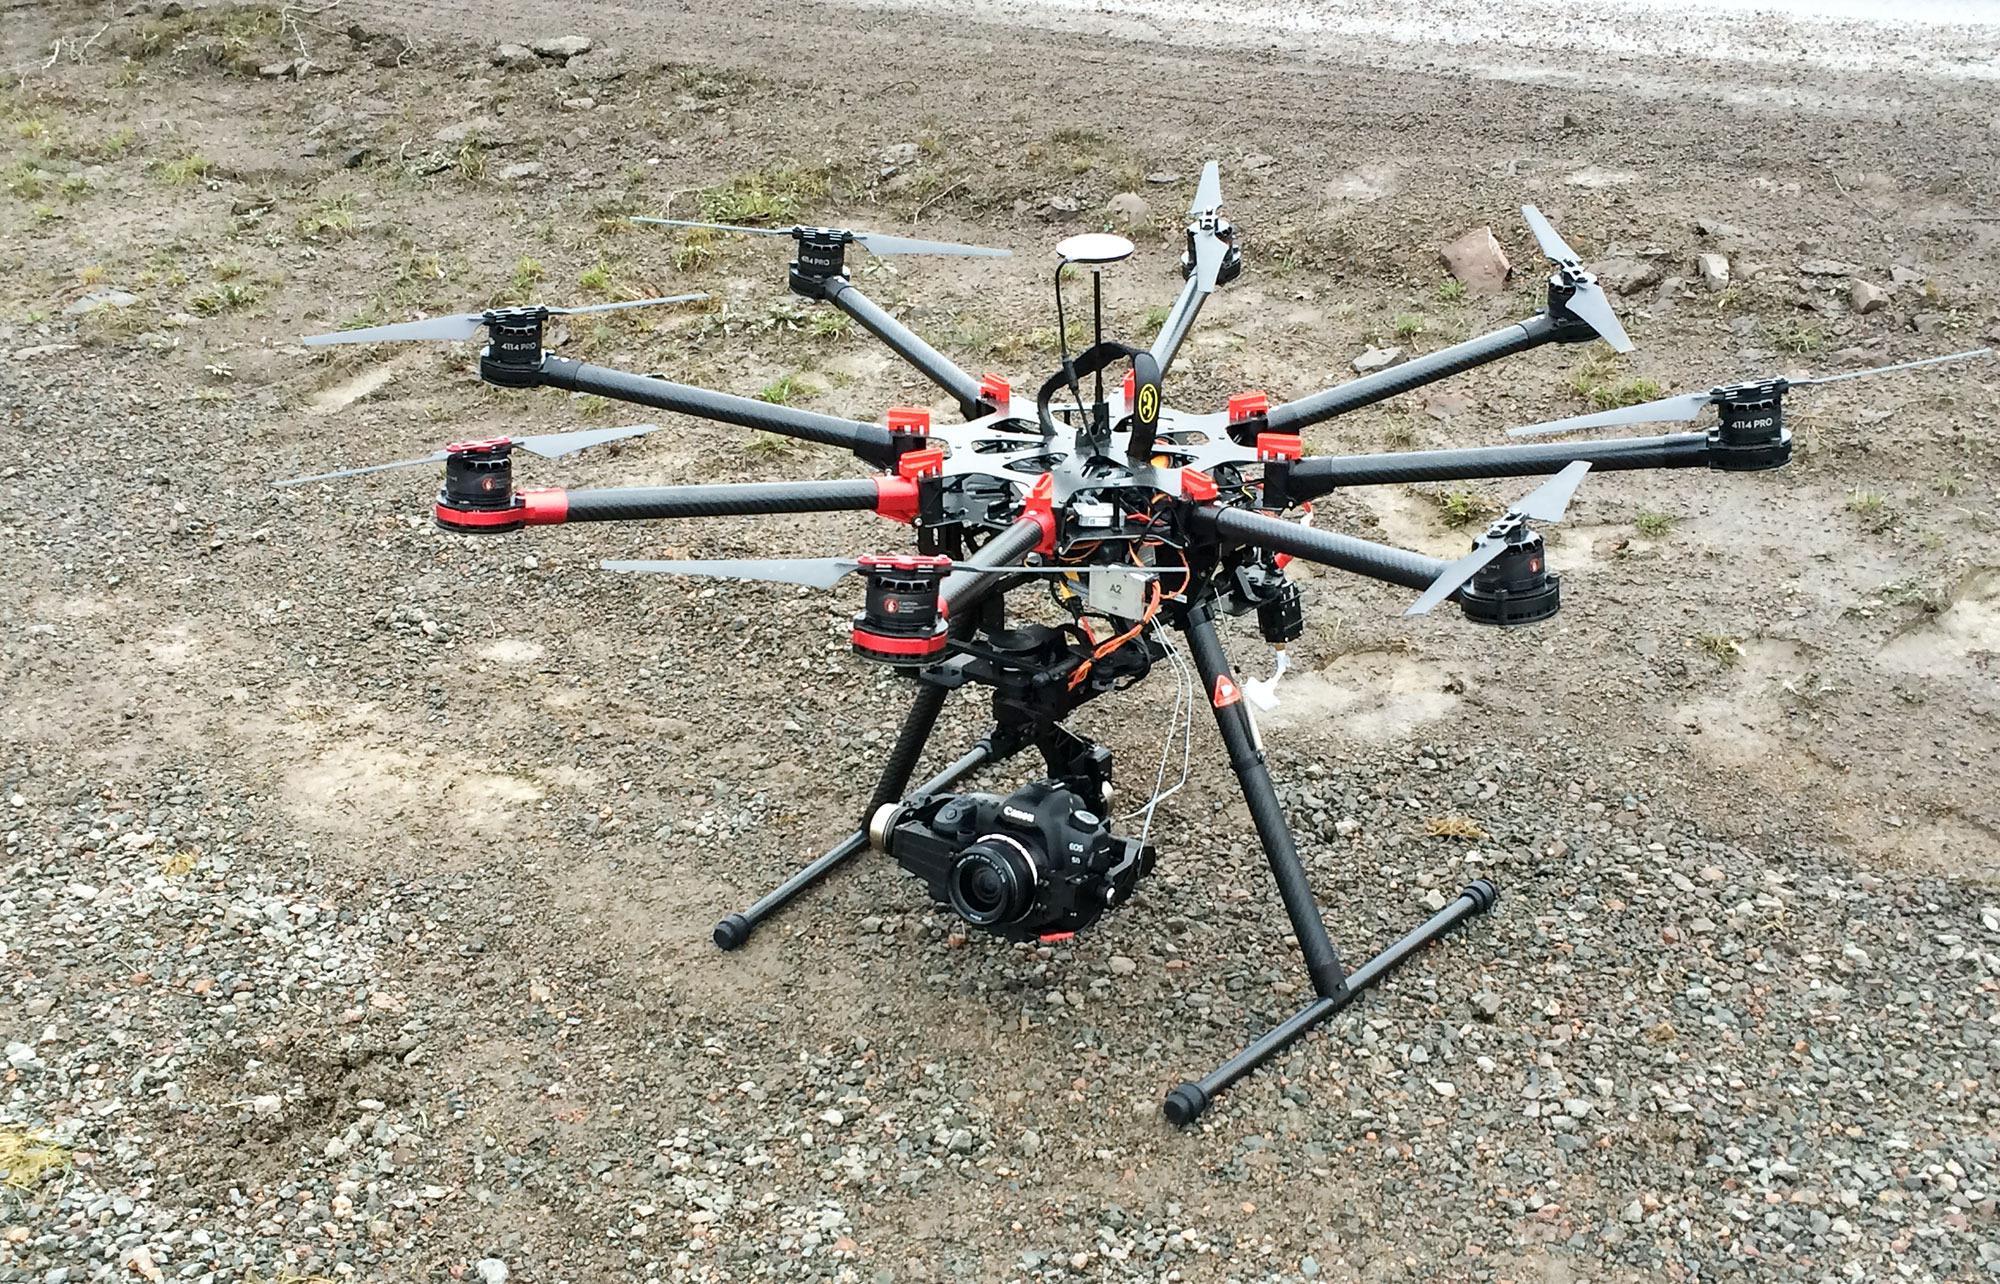 Her ser du Kim-David Østgårds octocopter. Foto: Skymedia.no